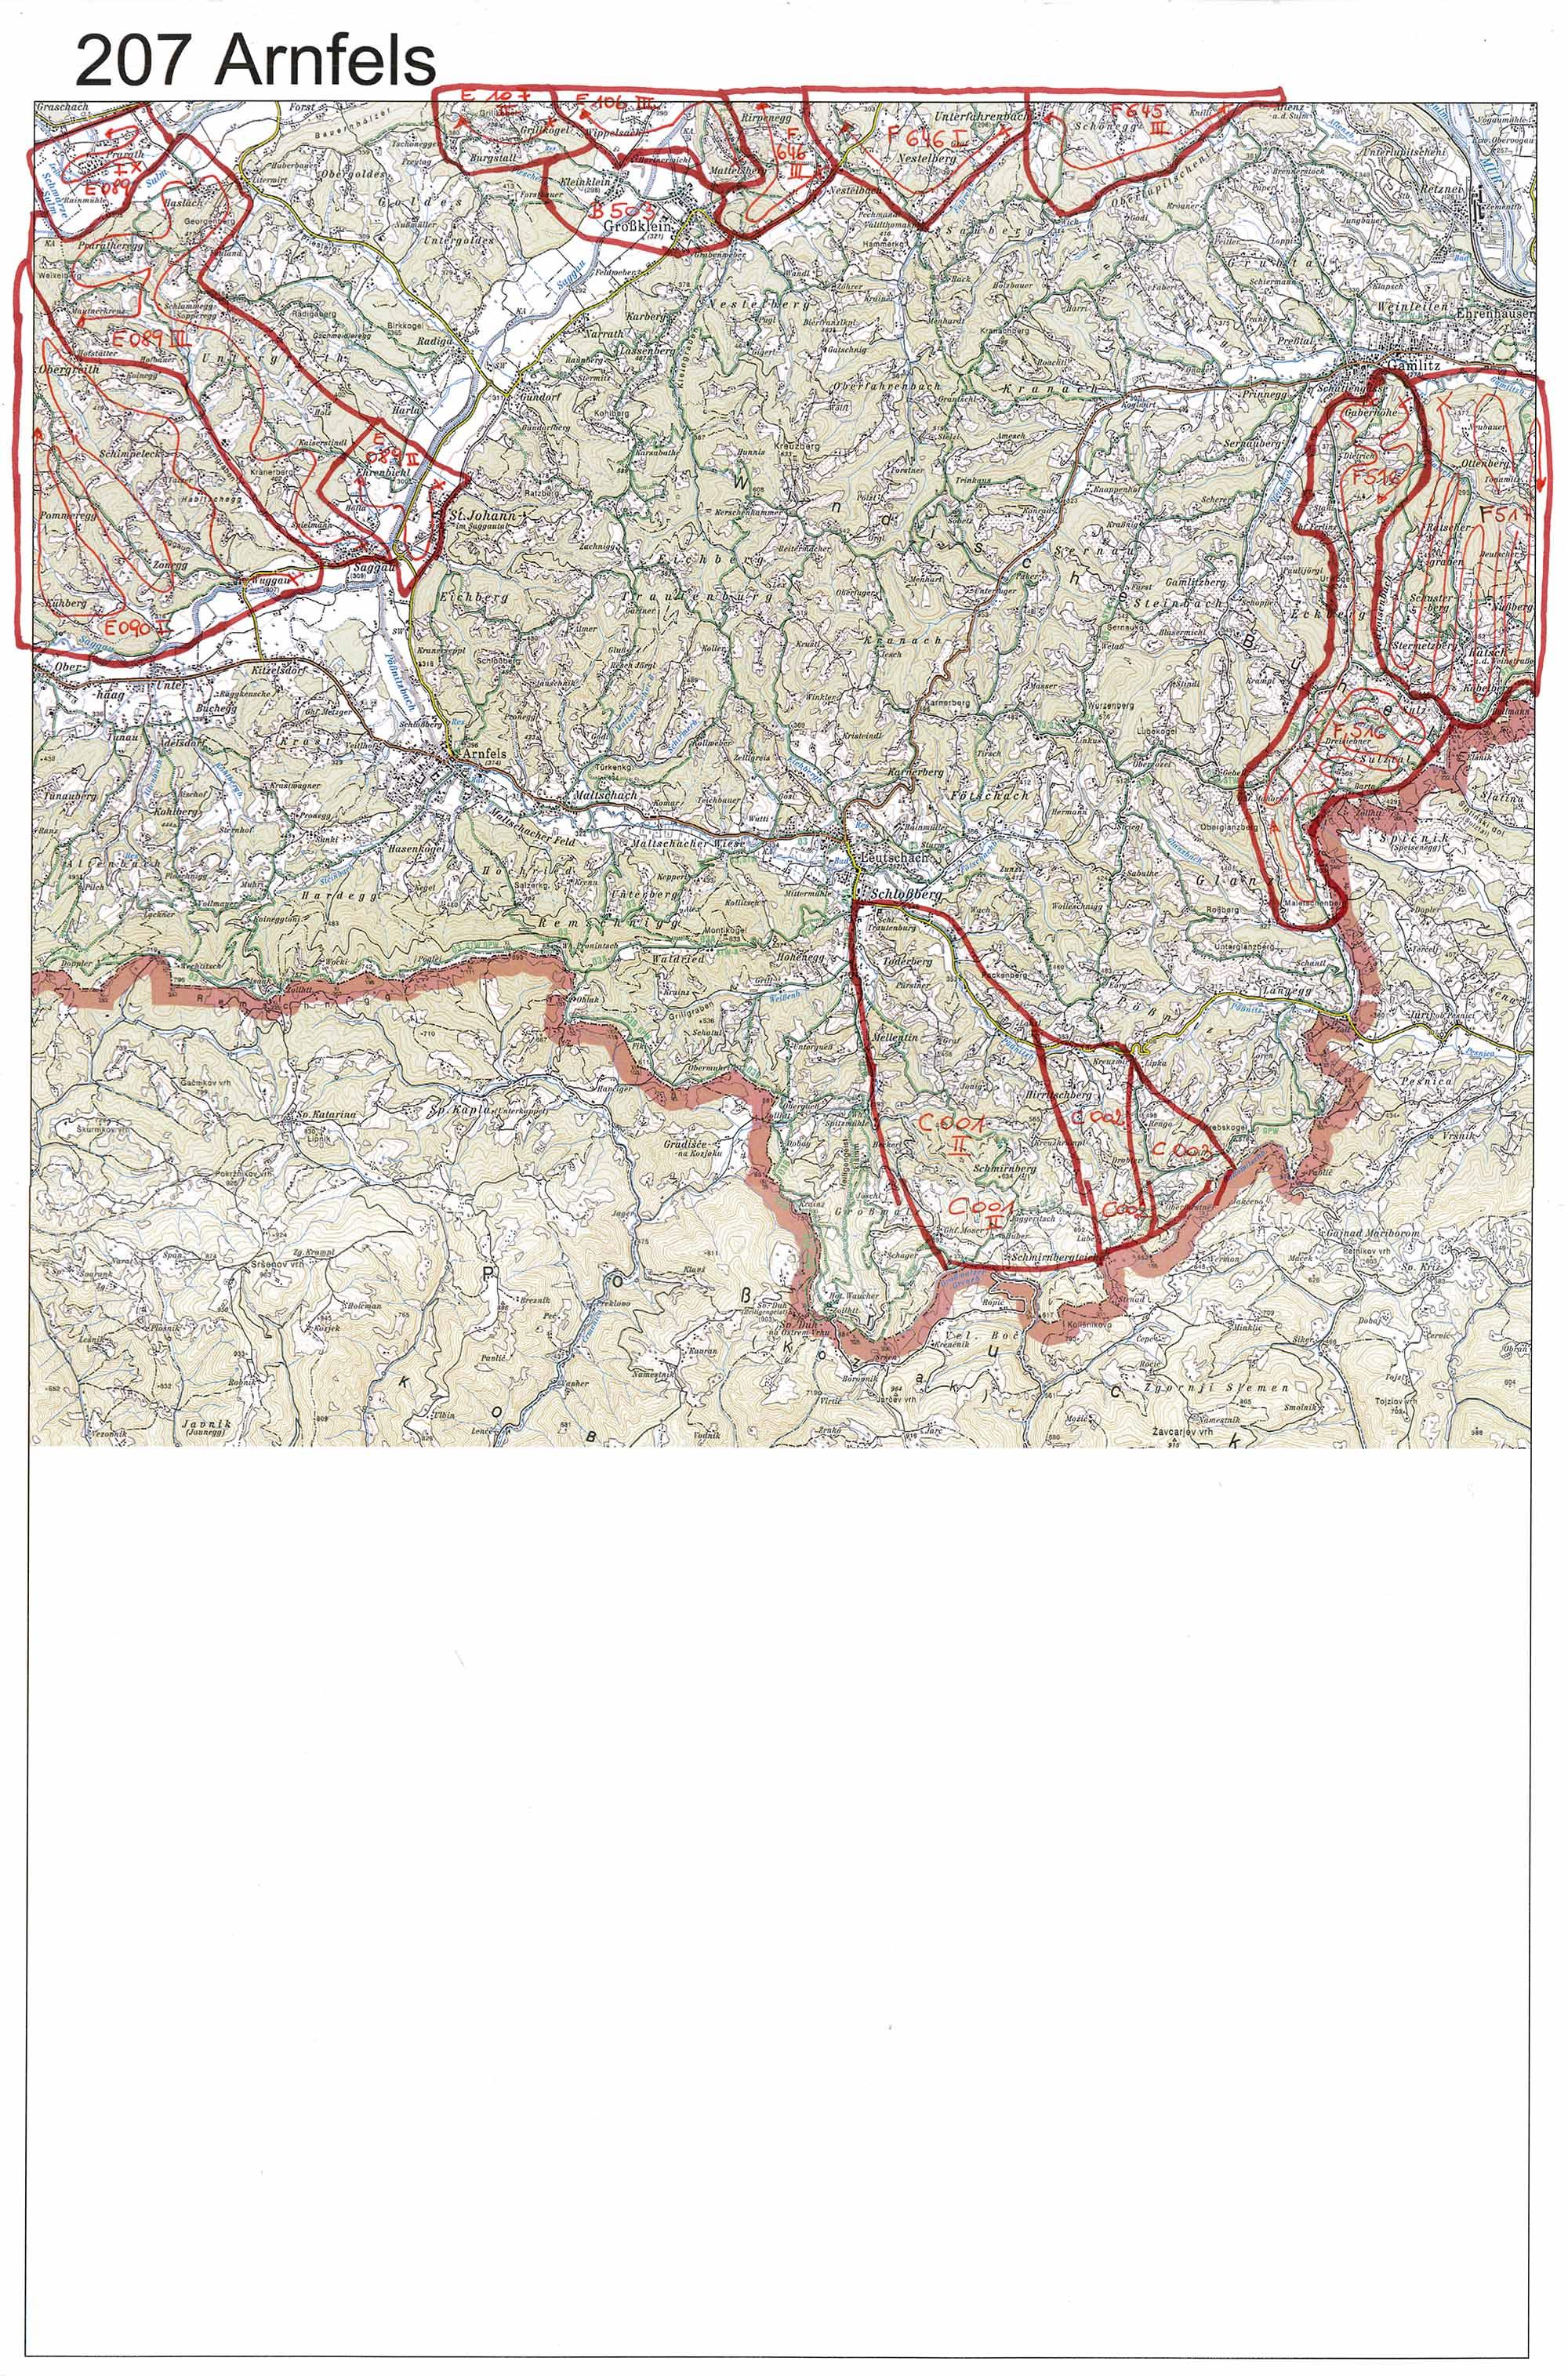 aerofoto- Karte 207